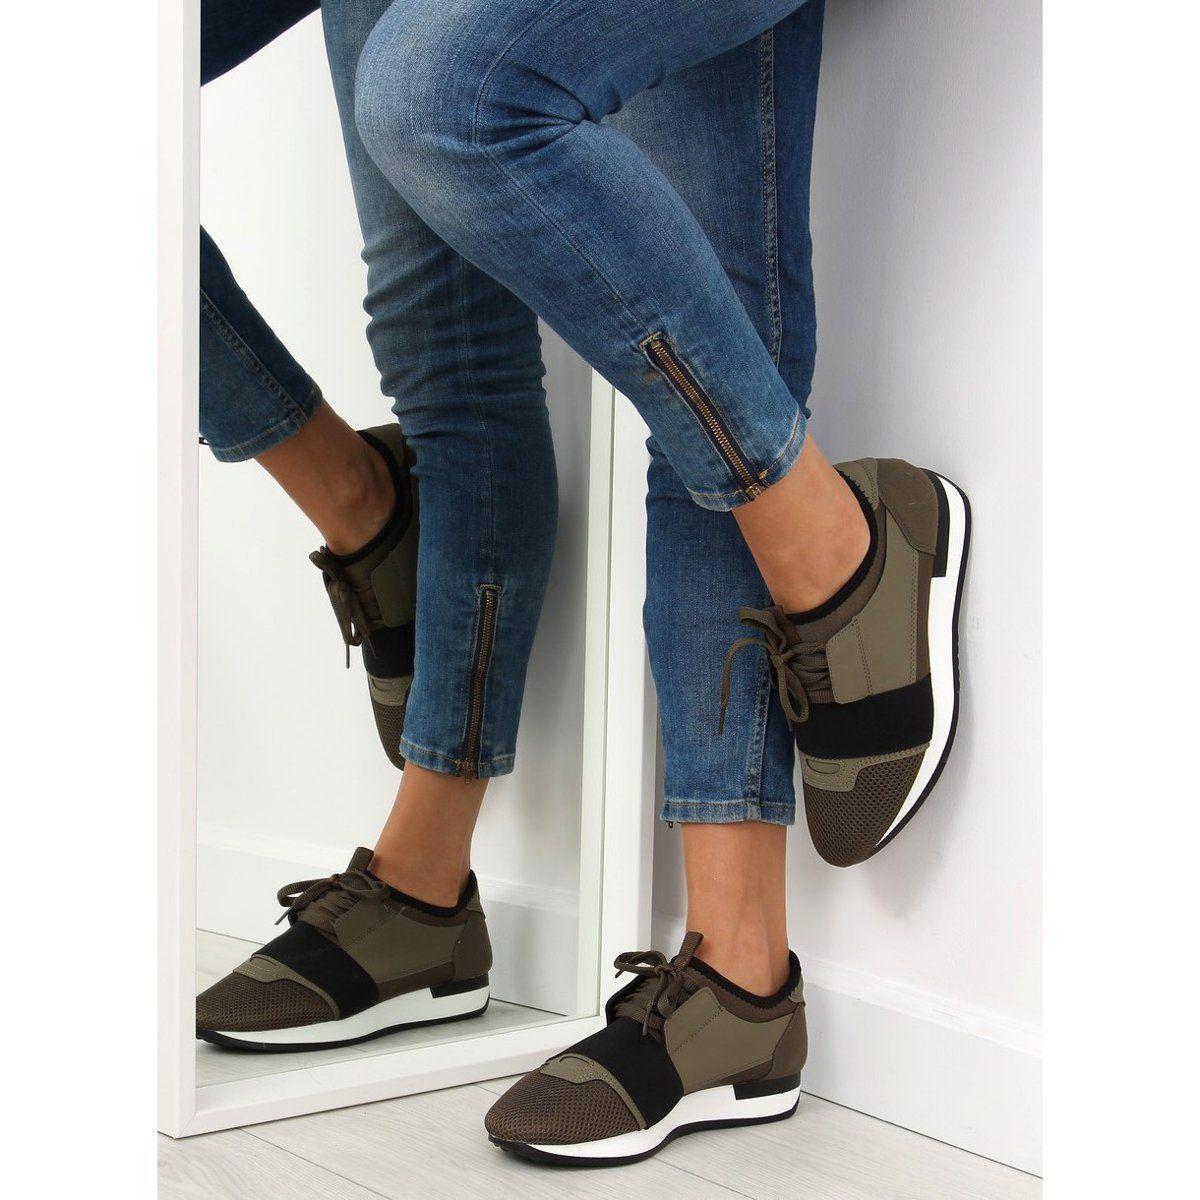 Buty Sportowe Zielone K1x063 Olive Insta Fashion Sneakers Shoes